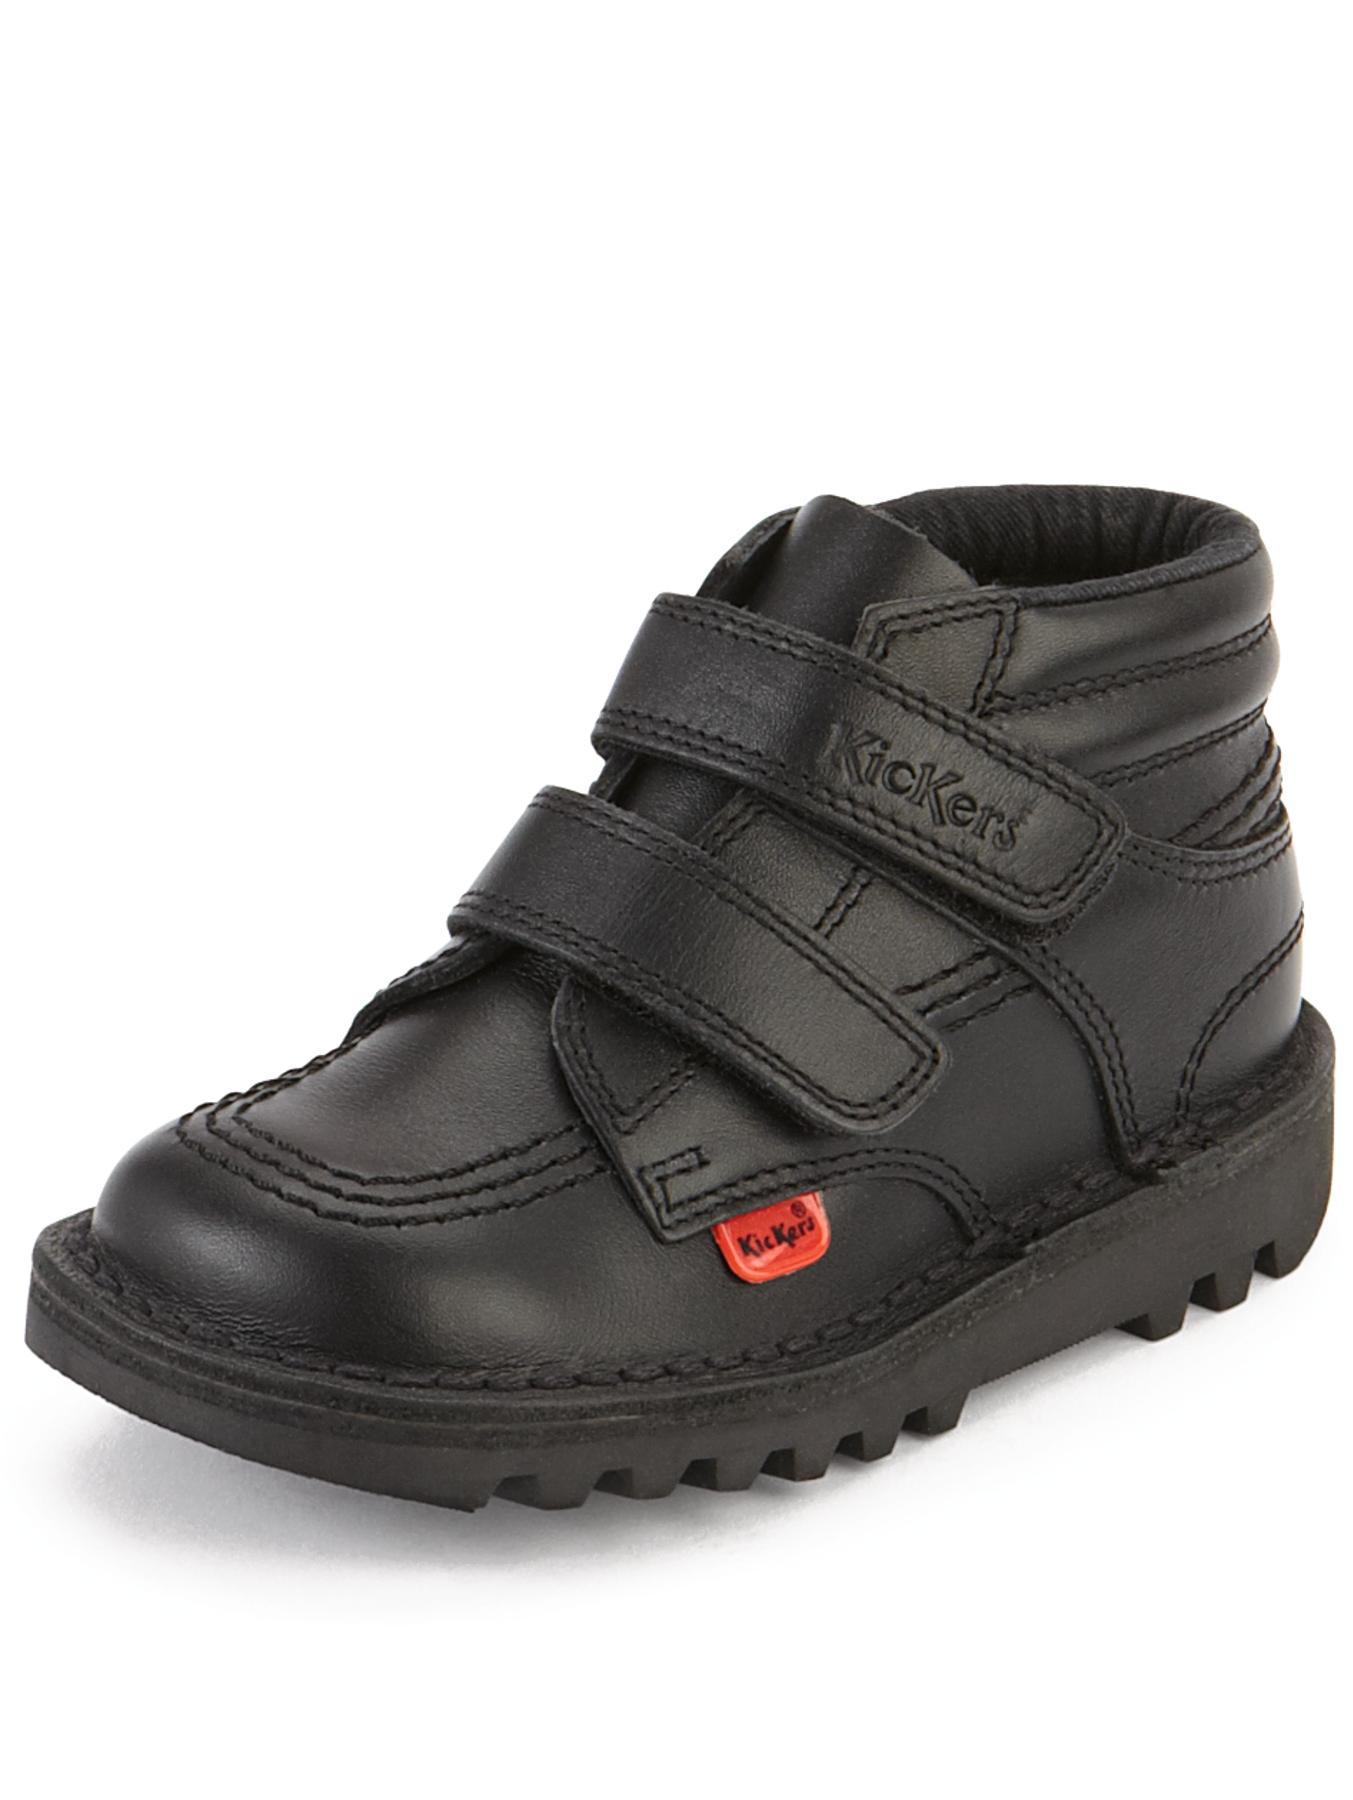 Cheap Kickers Womens Shoes